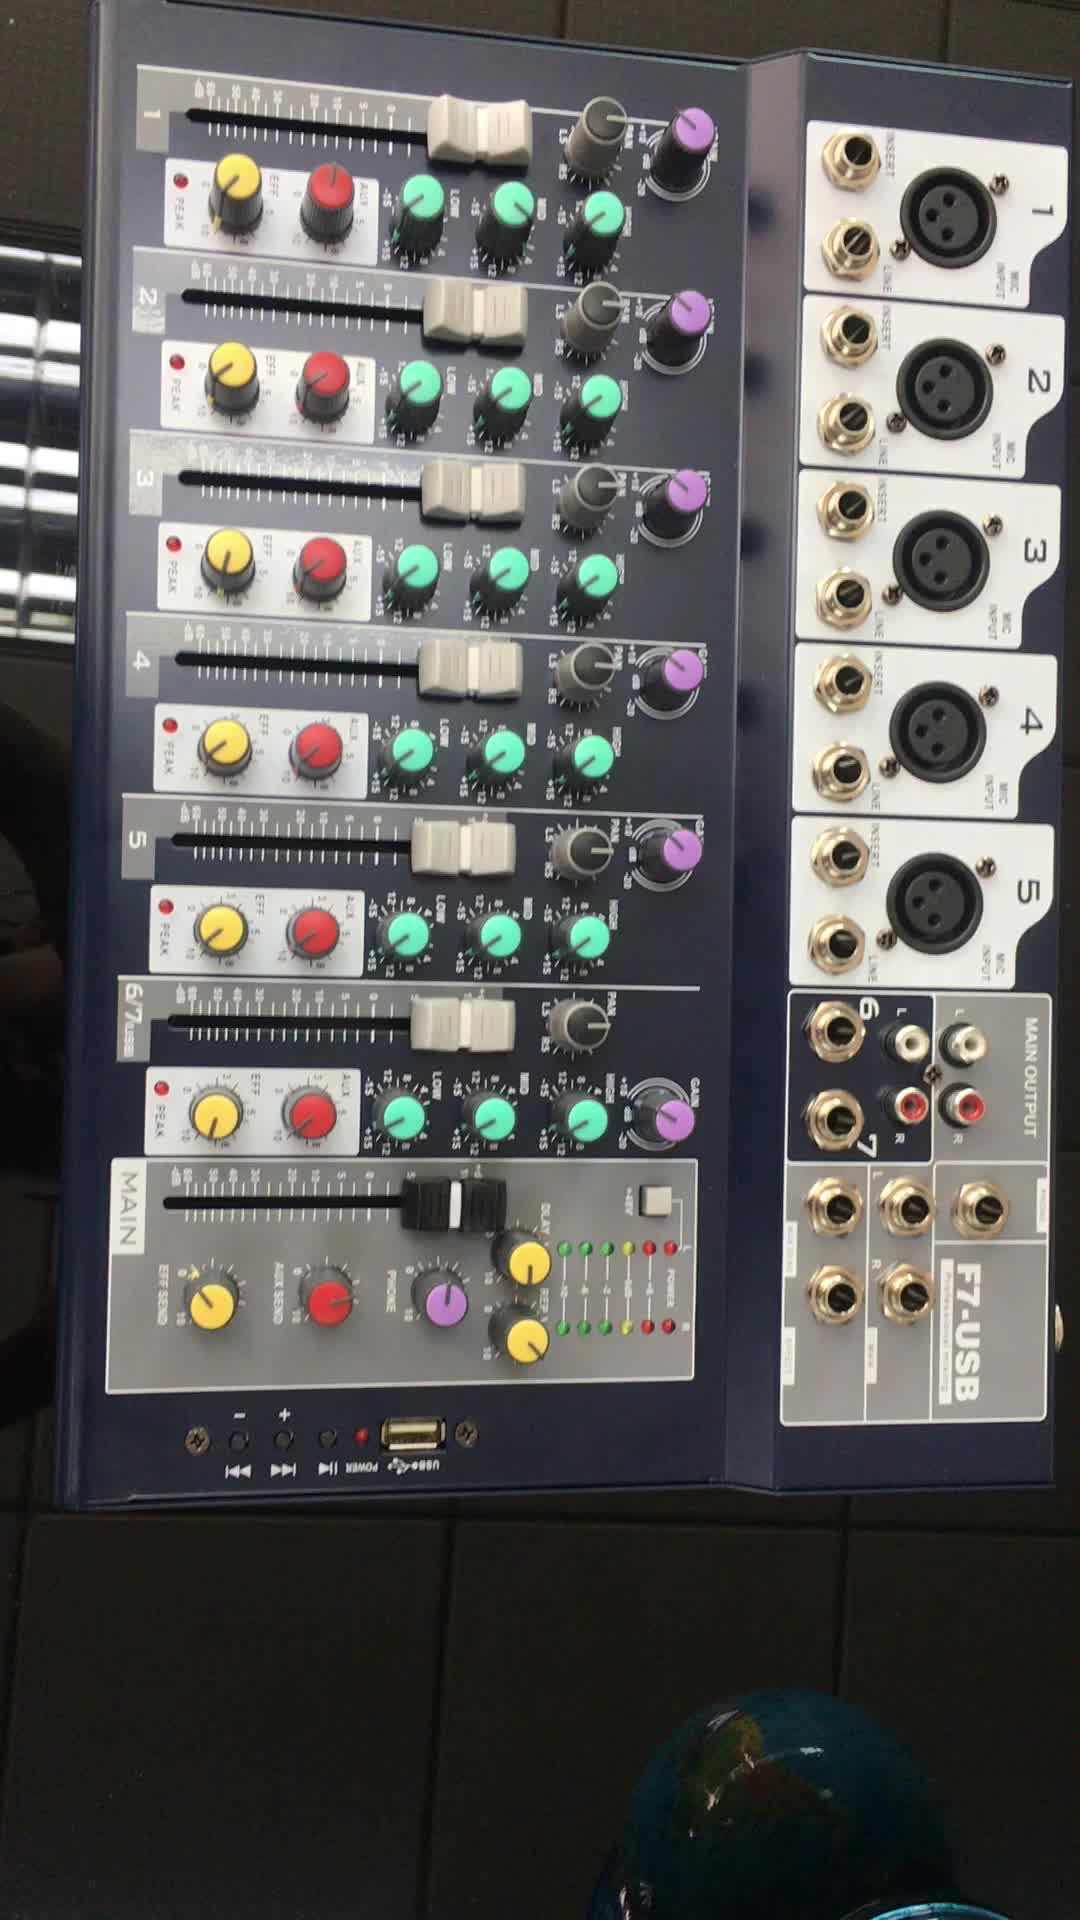 dj digitlal audio mixer console mac windowipad buy digital console mixer digital mixer audio. Black Bedroom Furniture Sets. Home Design Ideas